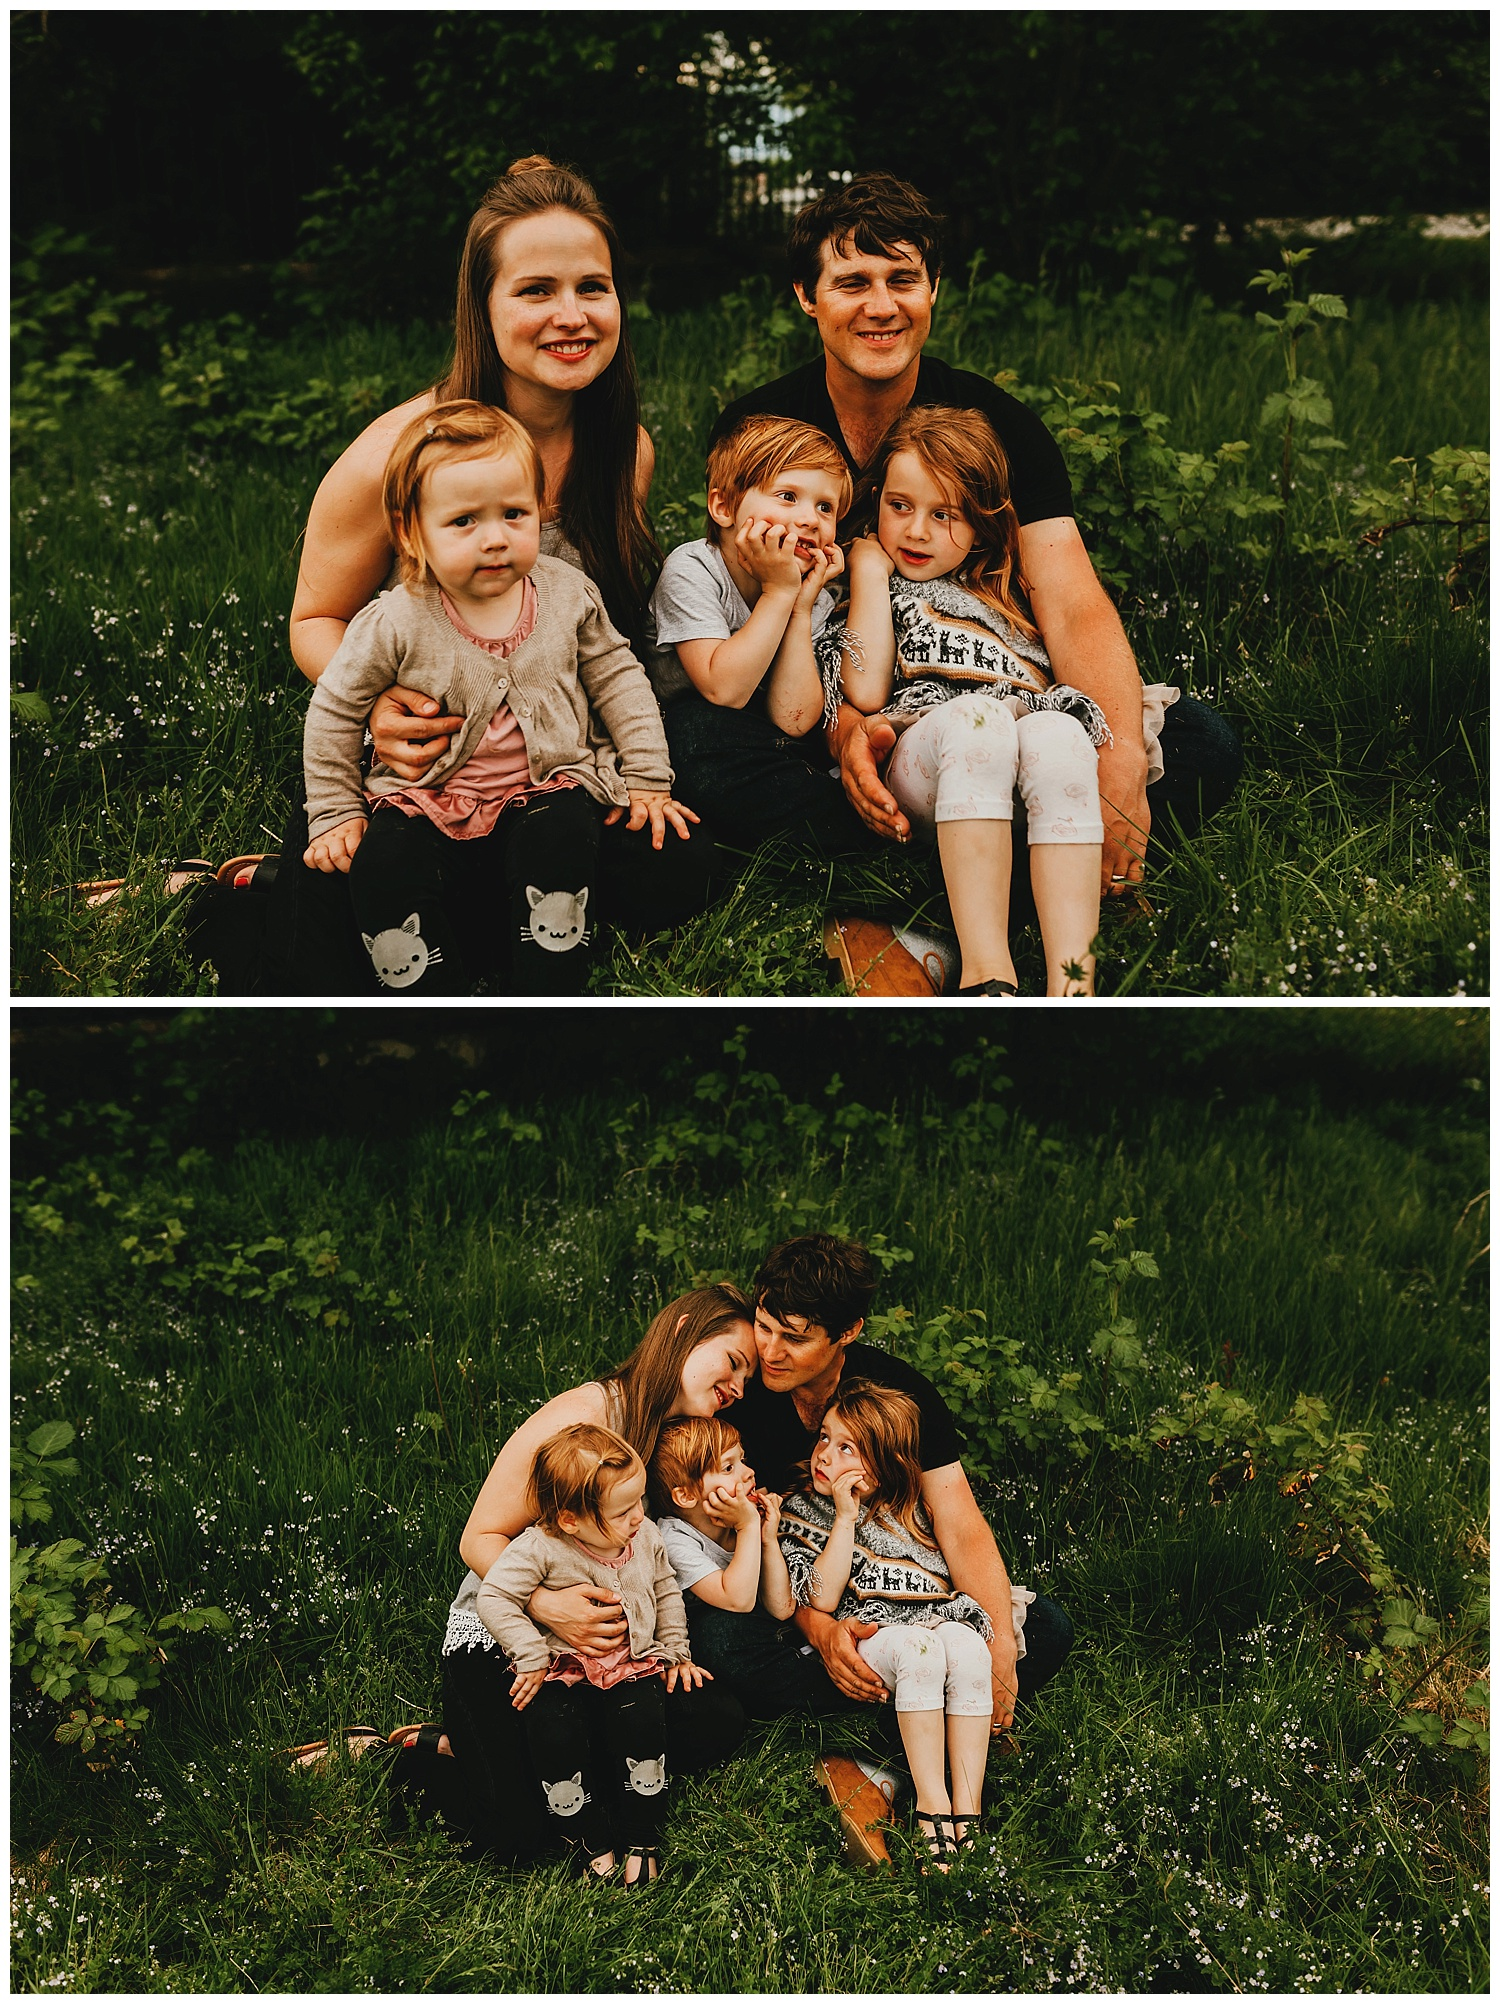 family photography_6.jpg